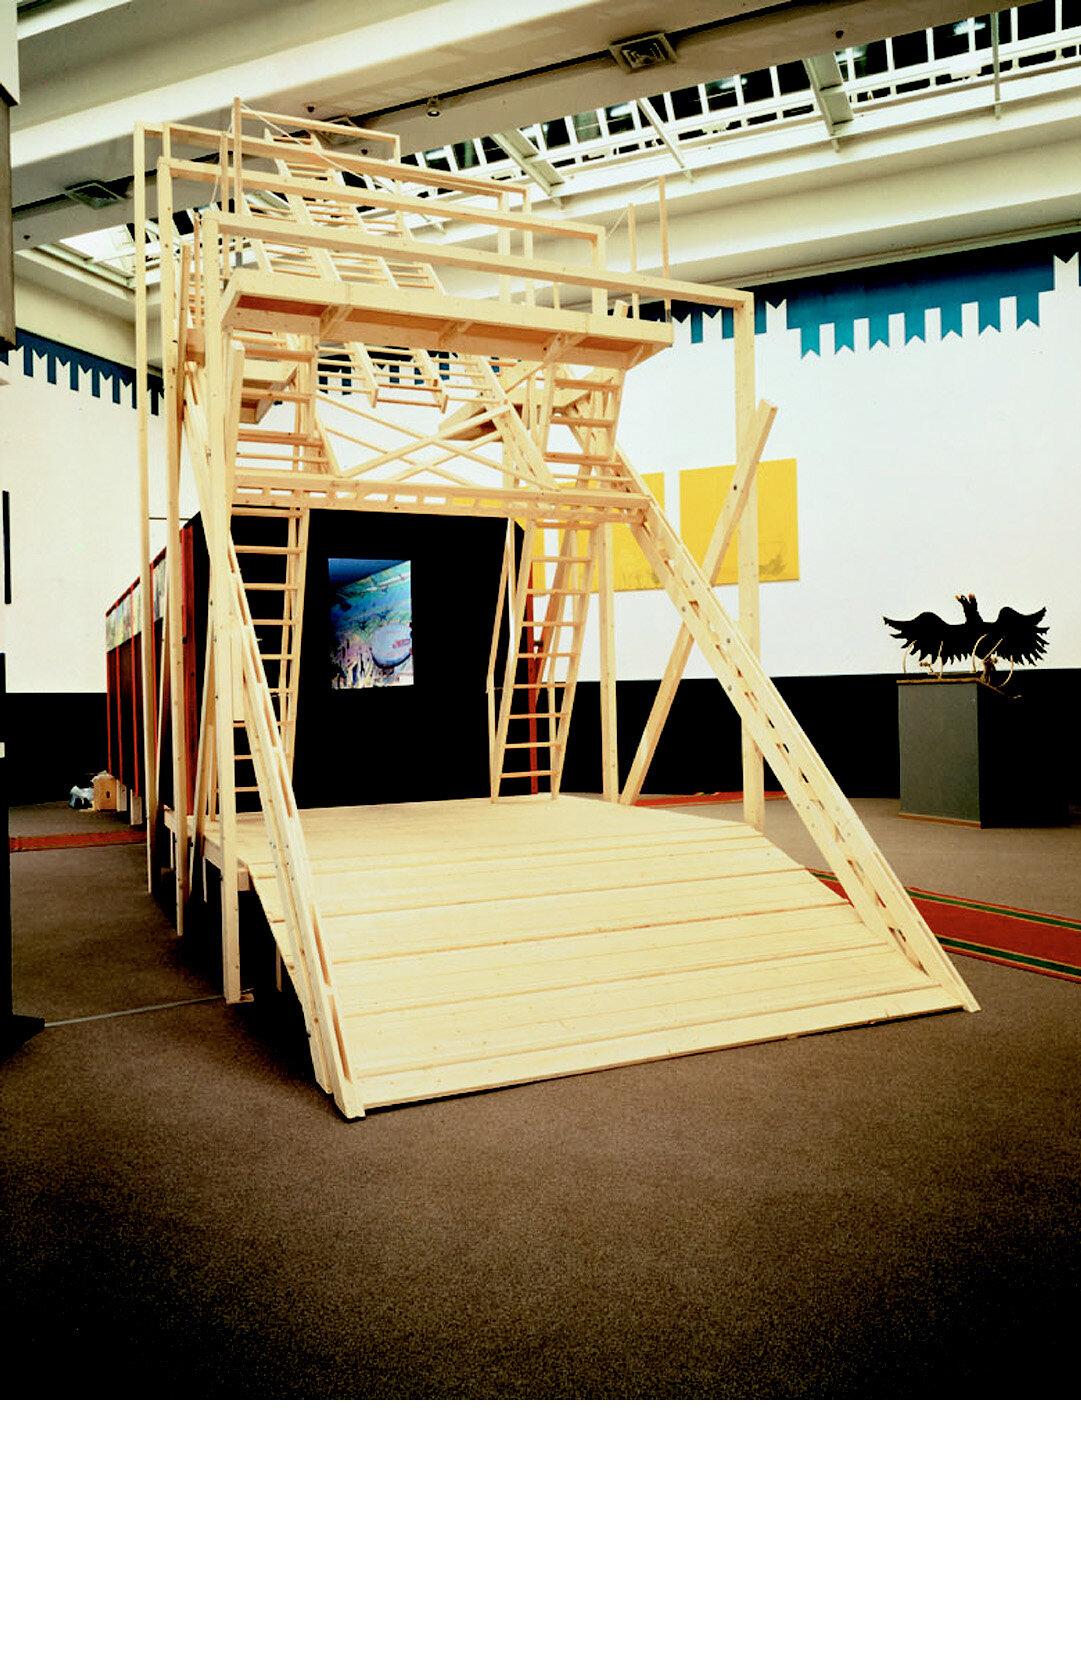 View-of-installation-Kunsthalle-Düsseldorf-Düsseldorf-1991-Photo-Nic-Tenwiggenhorn.jpg